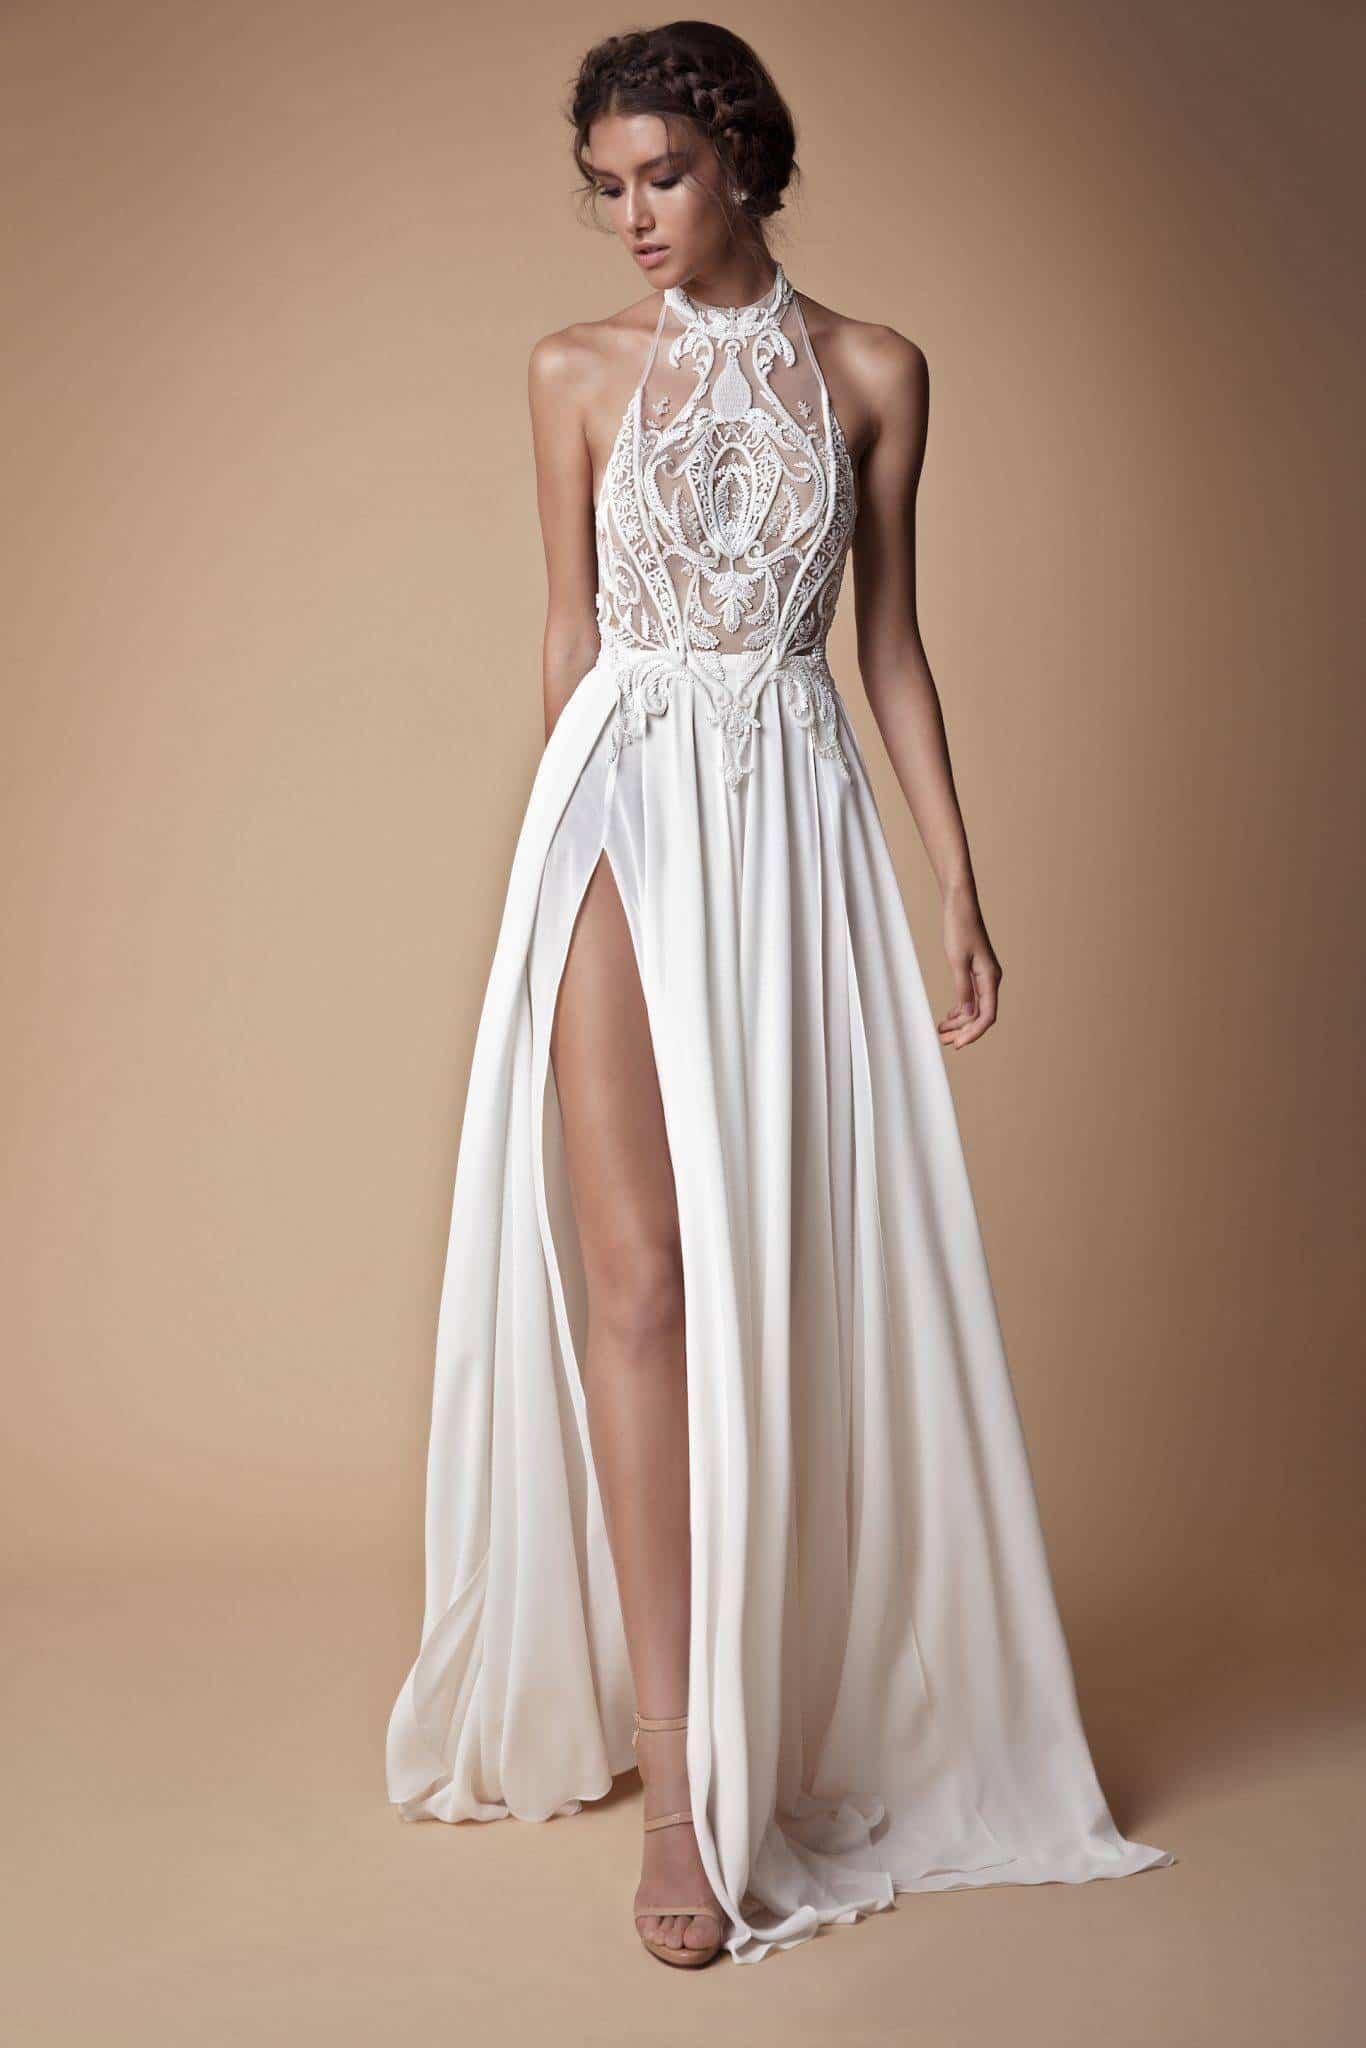 foto Daring Yet Feminine Wedding Dress Collection By Makany Marta